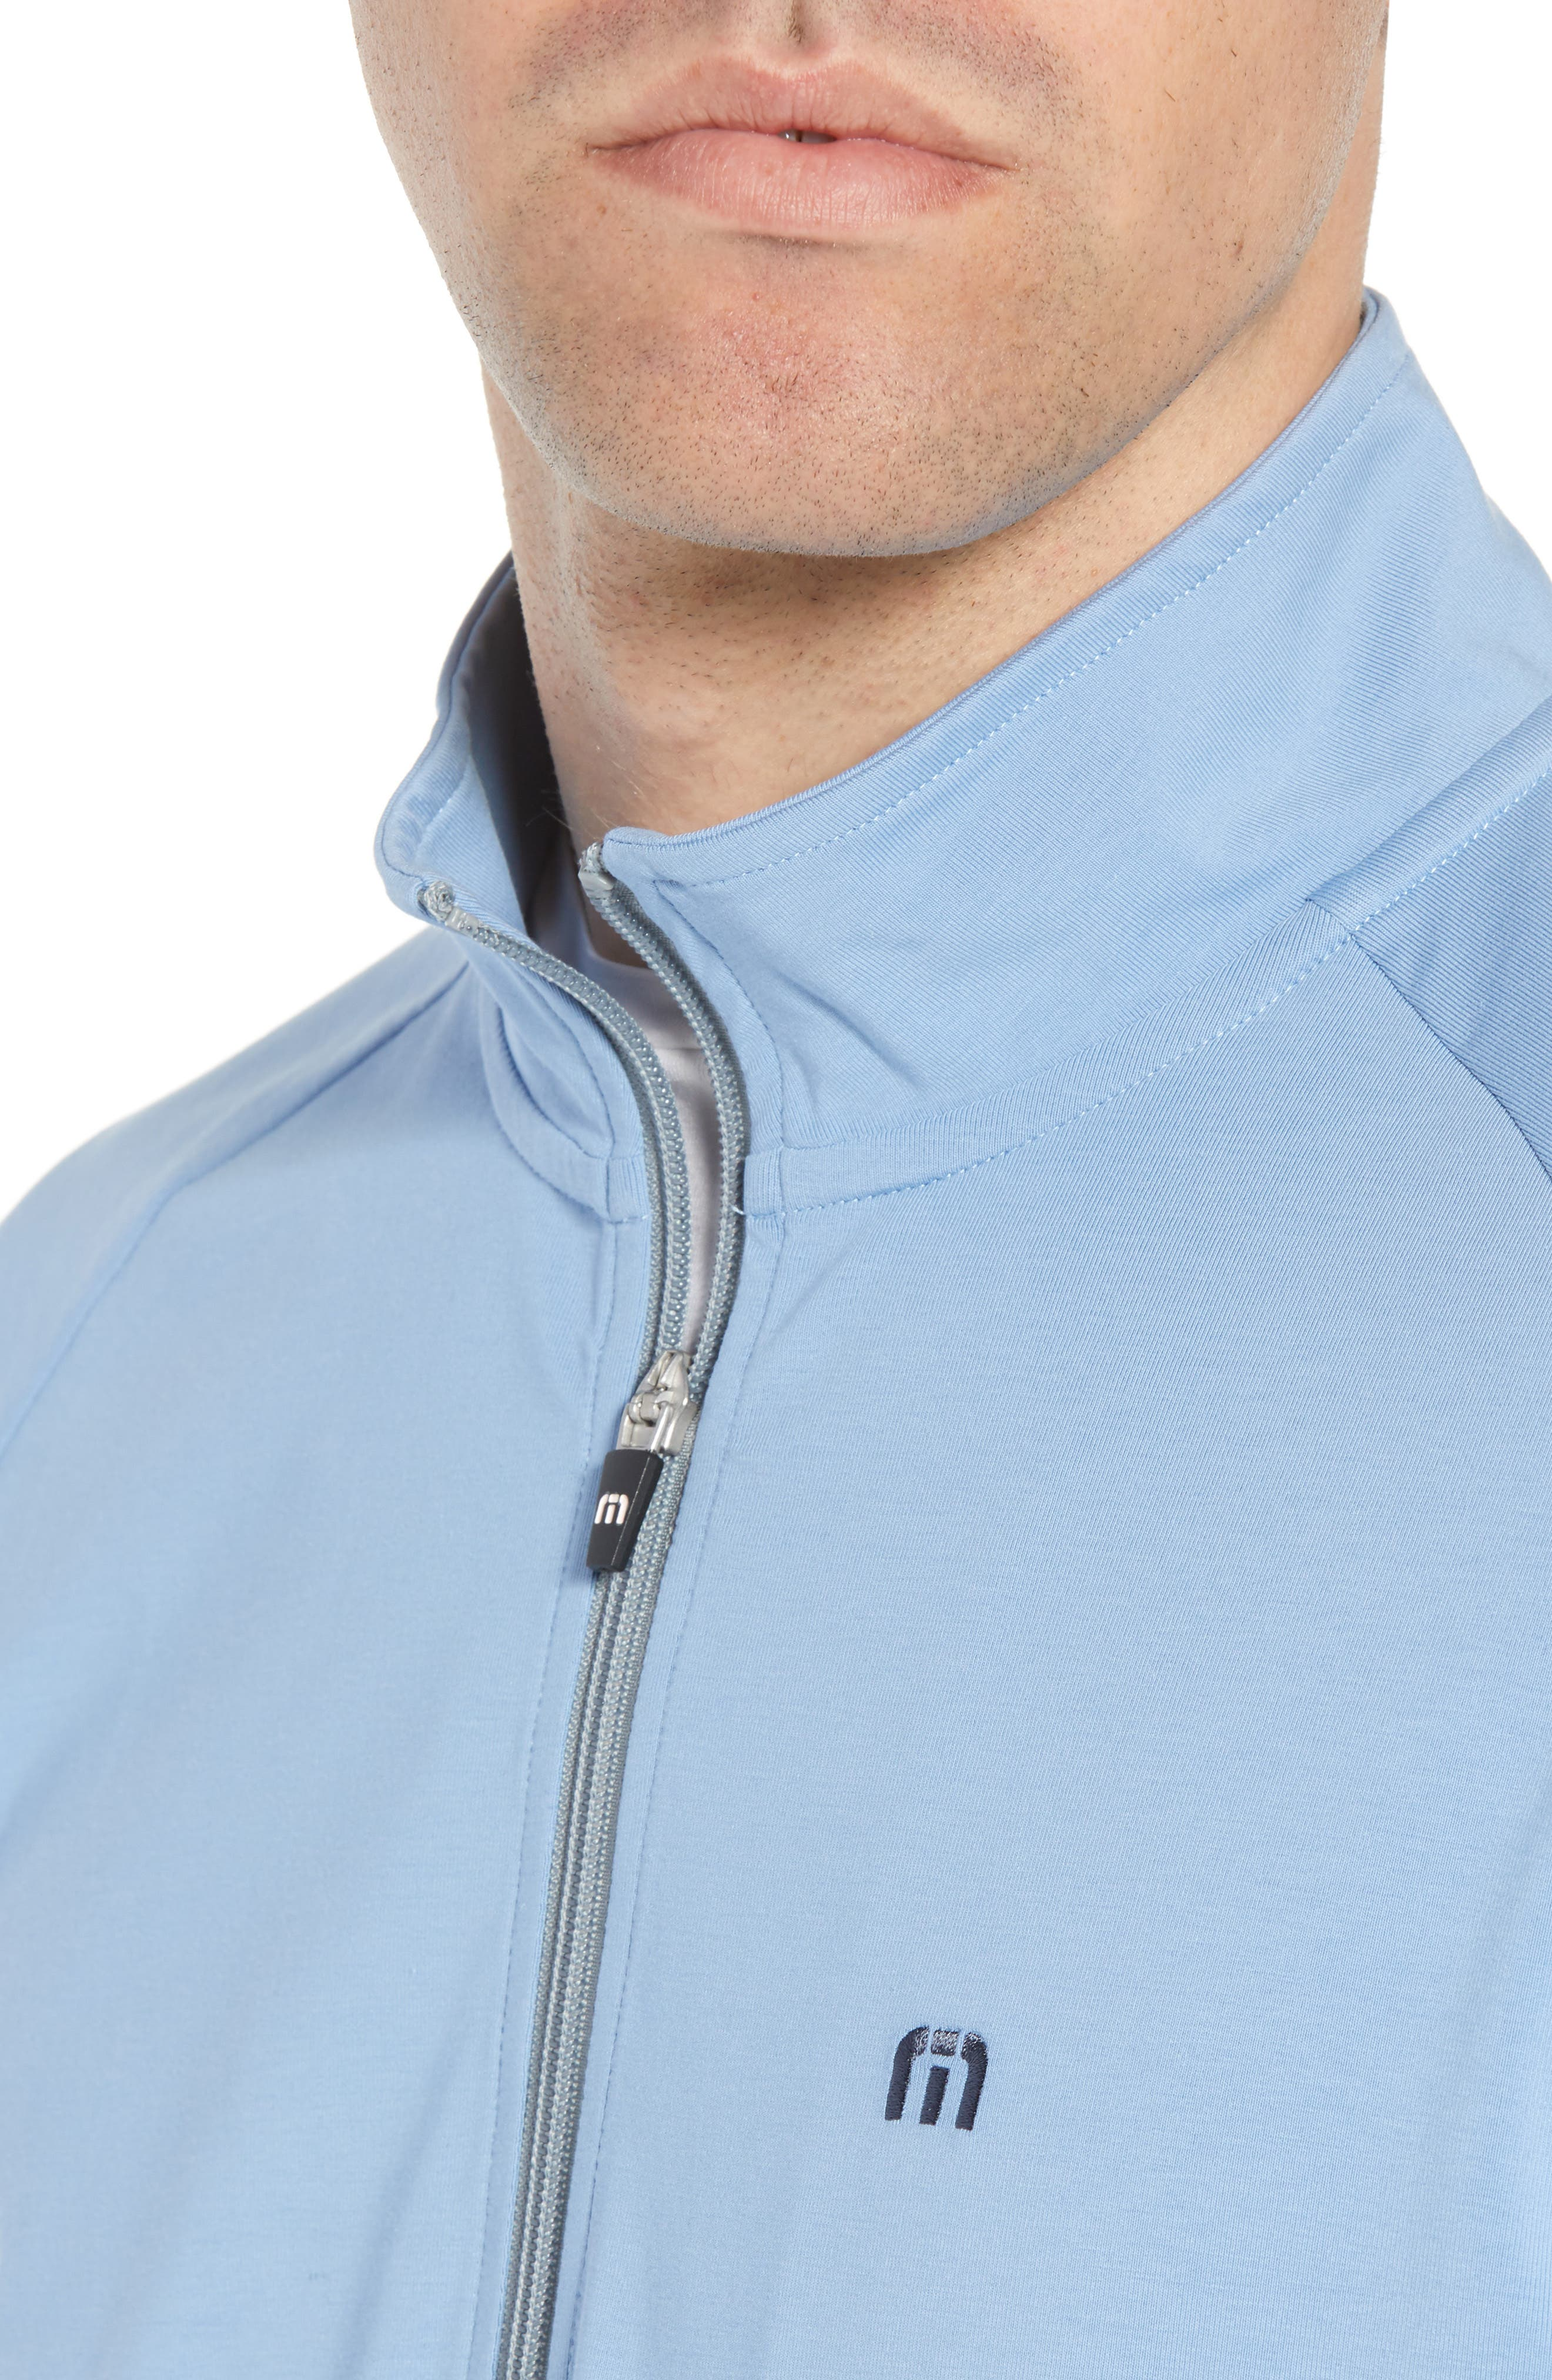 'Strange Love' Trim Fit Wrinkle Resistant Quarter Zip Jacket,                             Alternate thumbnail 4, color,                             ALLURE